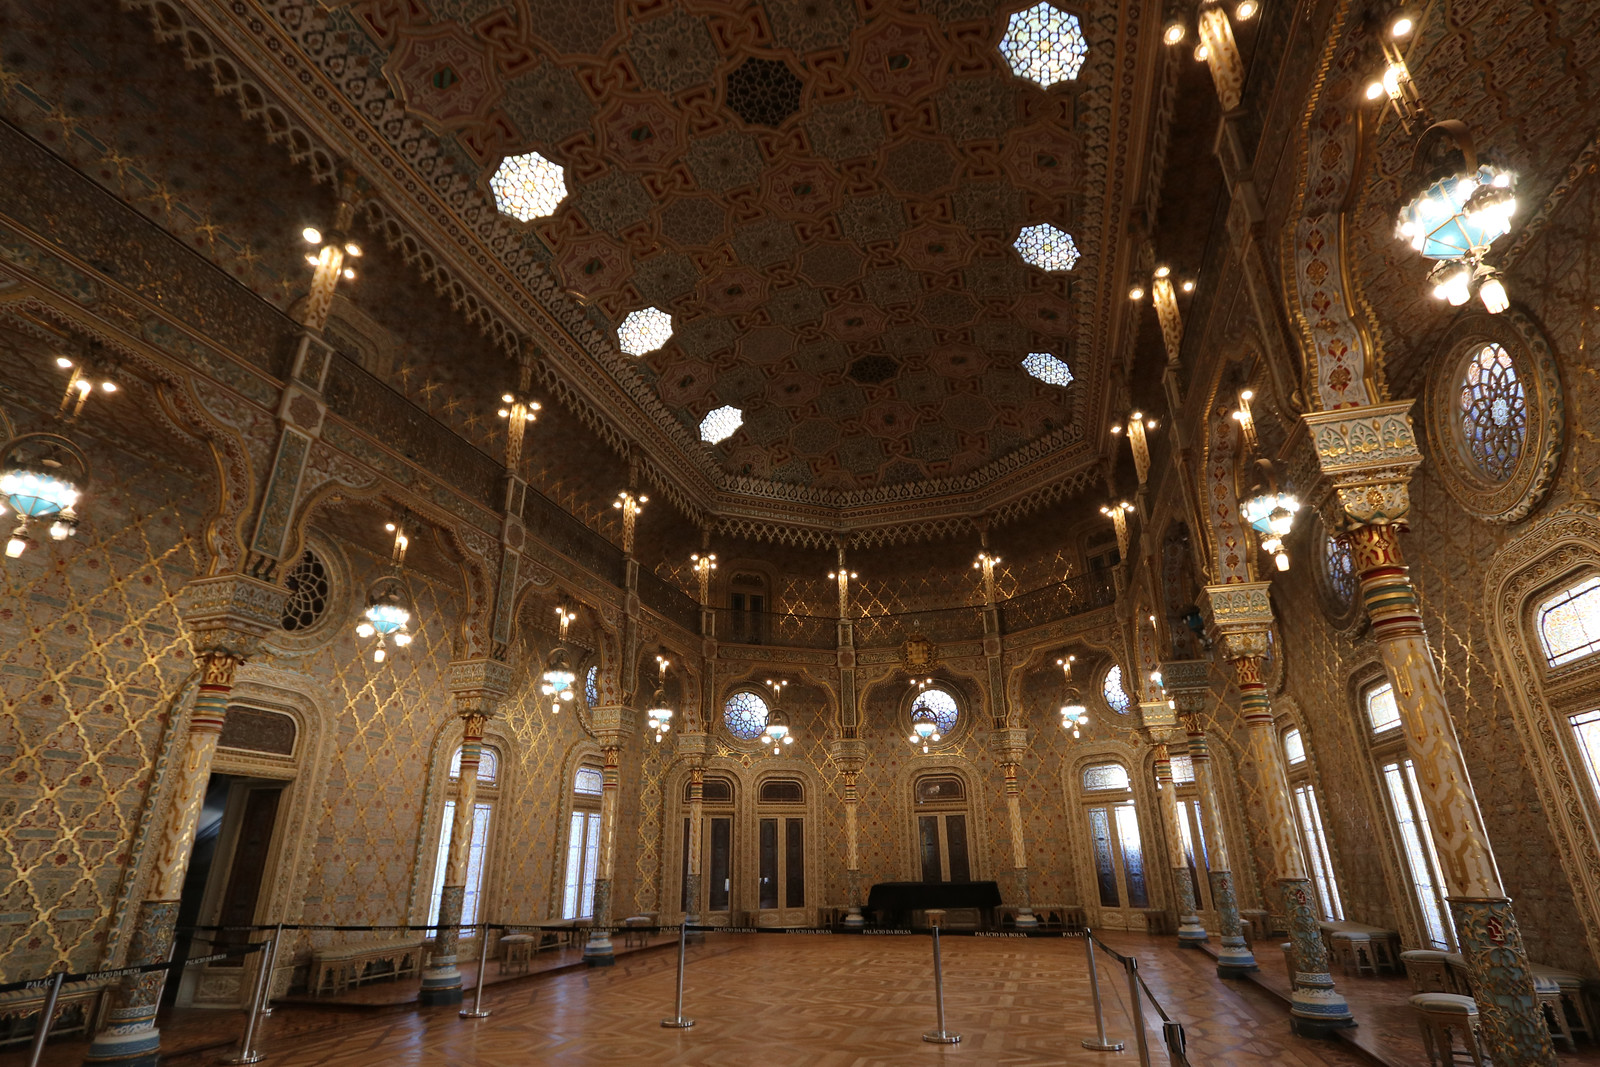 Arab Room, Palácio da Bolsa